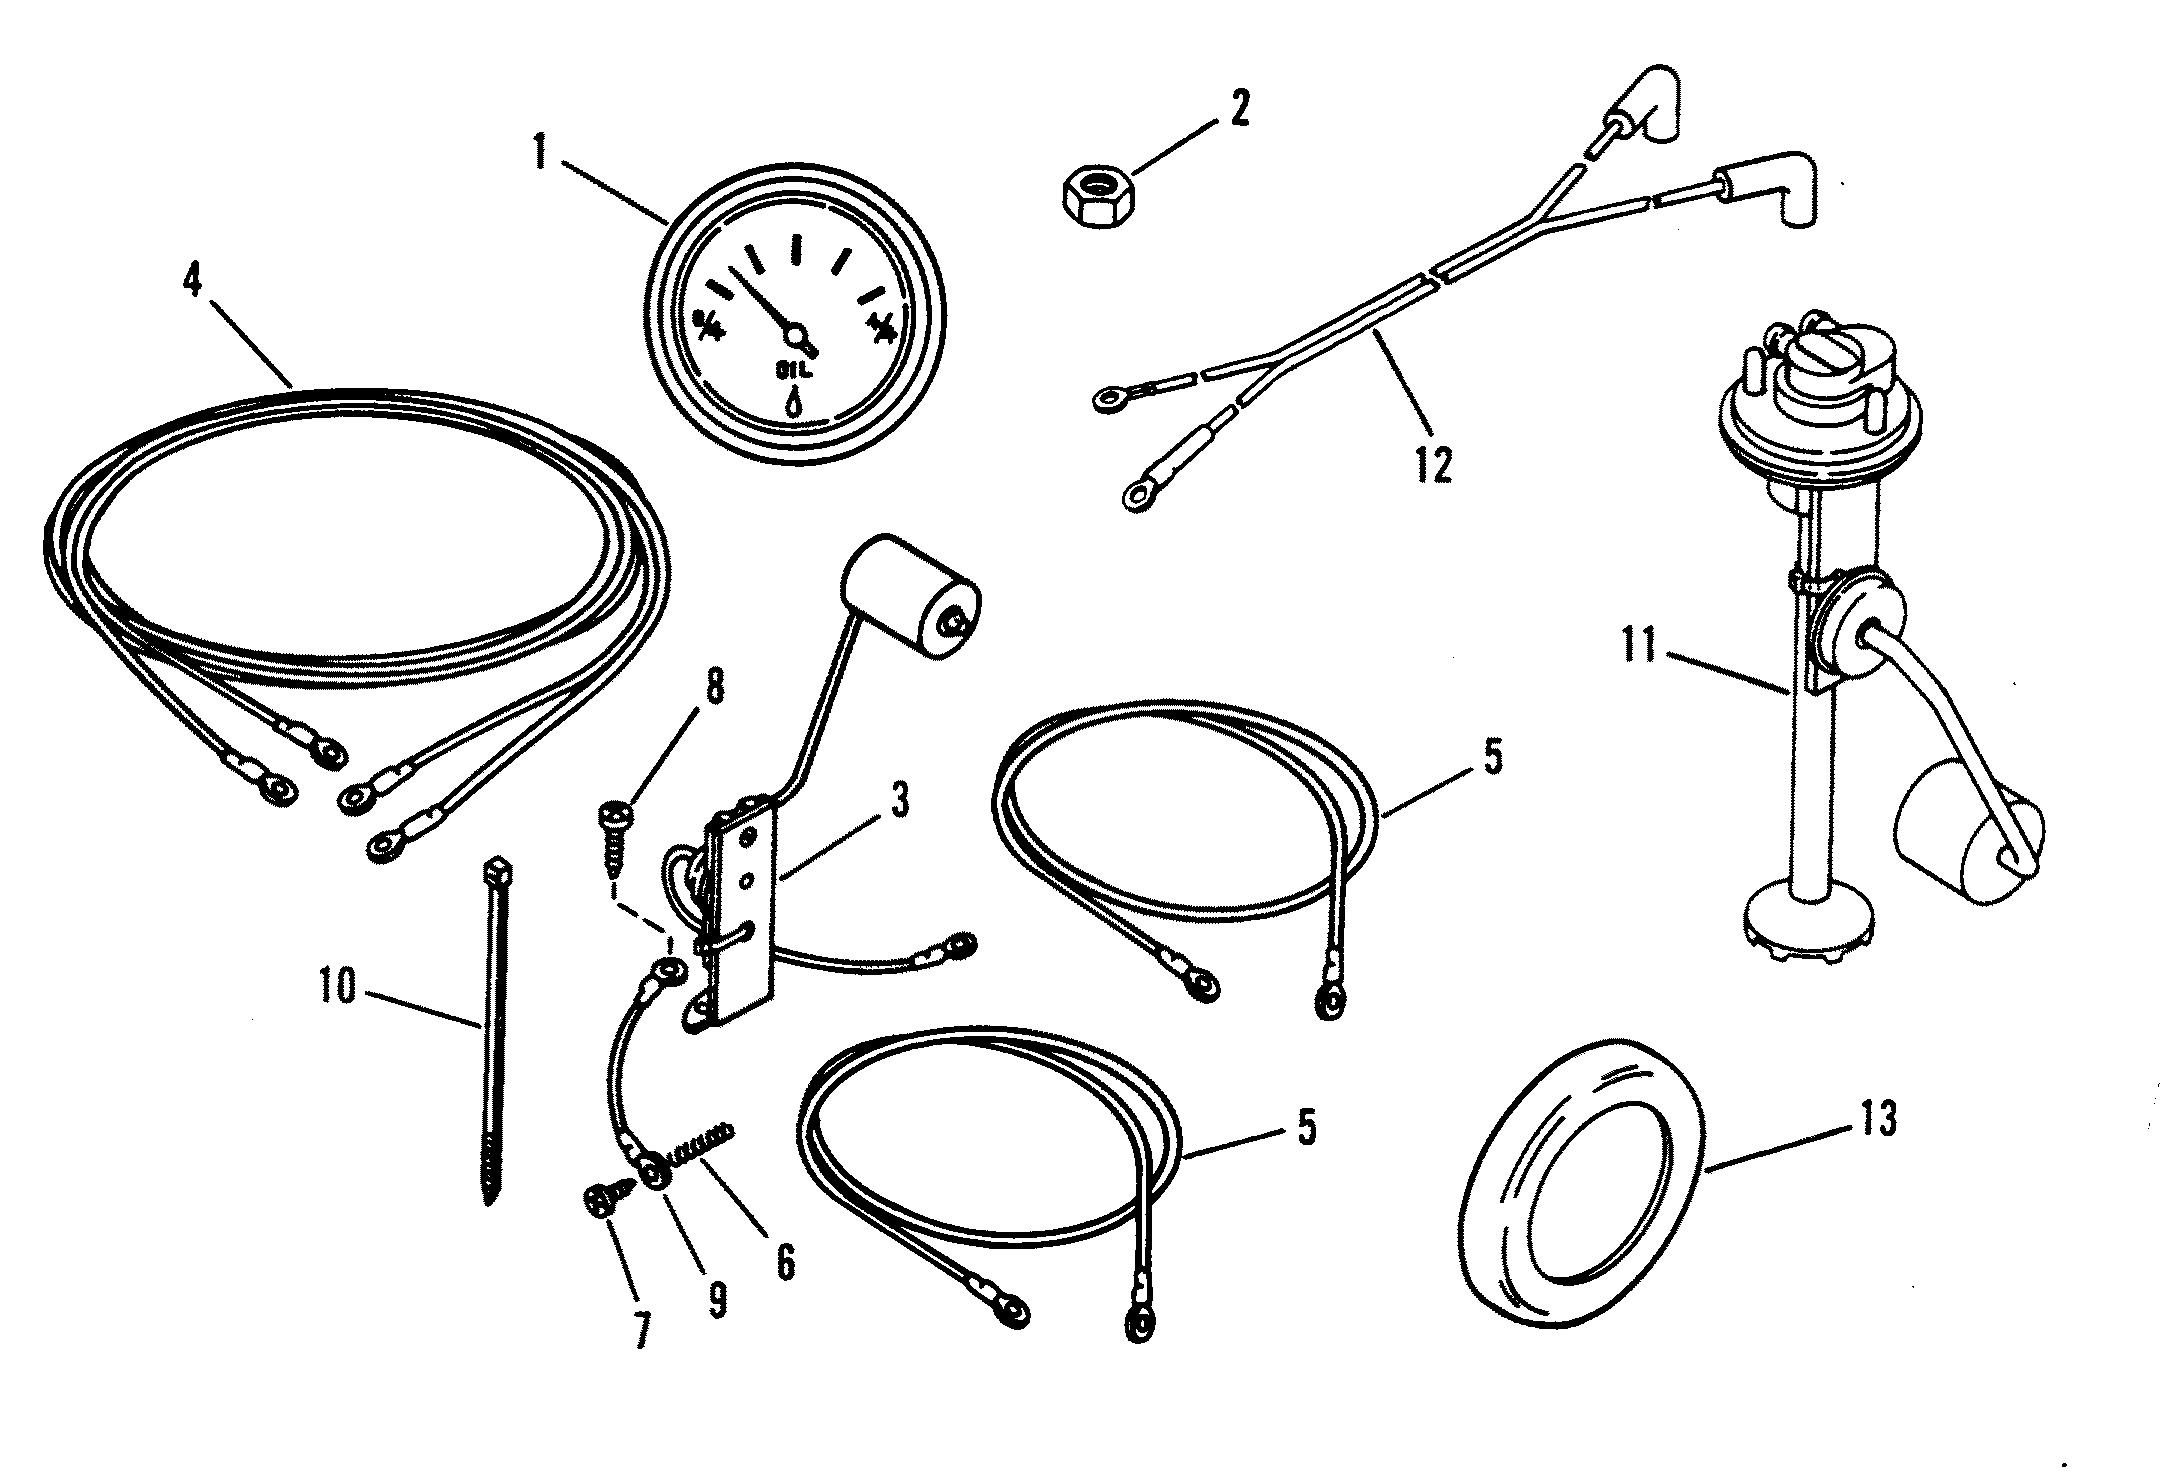 u041a u0430 u0442 u0430 u043b u043e u0433  u0437 u0430 u043f u0447 u0430 u0441 u0442 u0435 u0439 accessories instruments